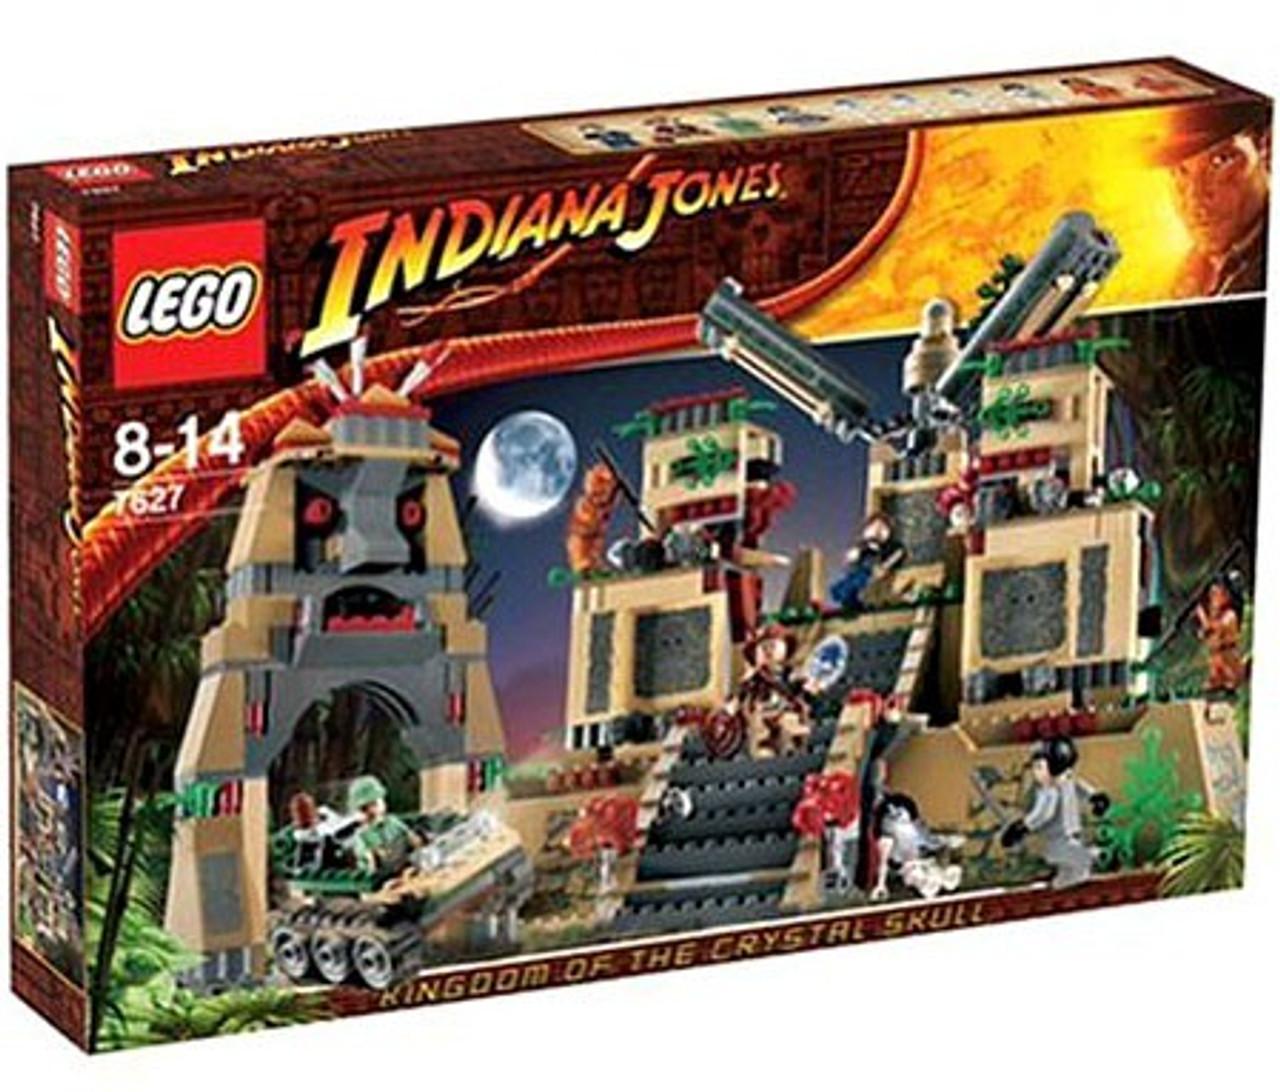 LEGO Indiana Jones Temple Of The Crystal Skull Set 7627